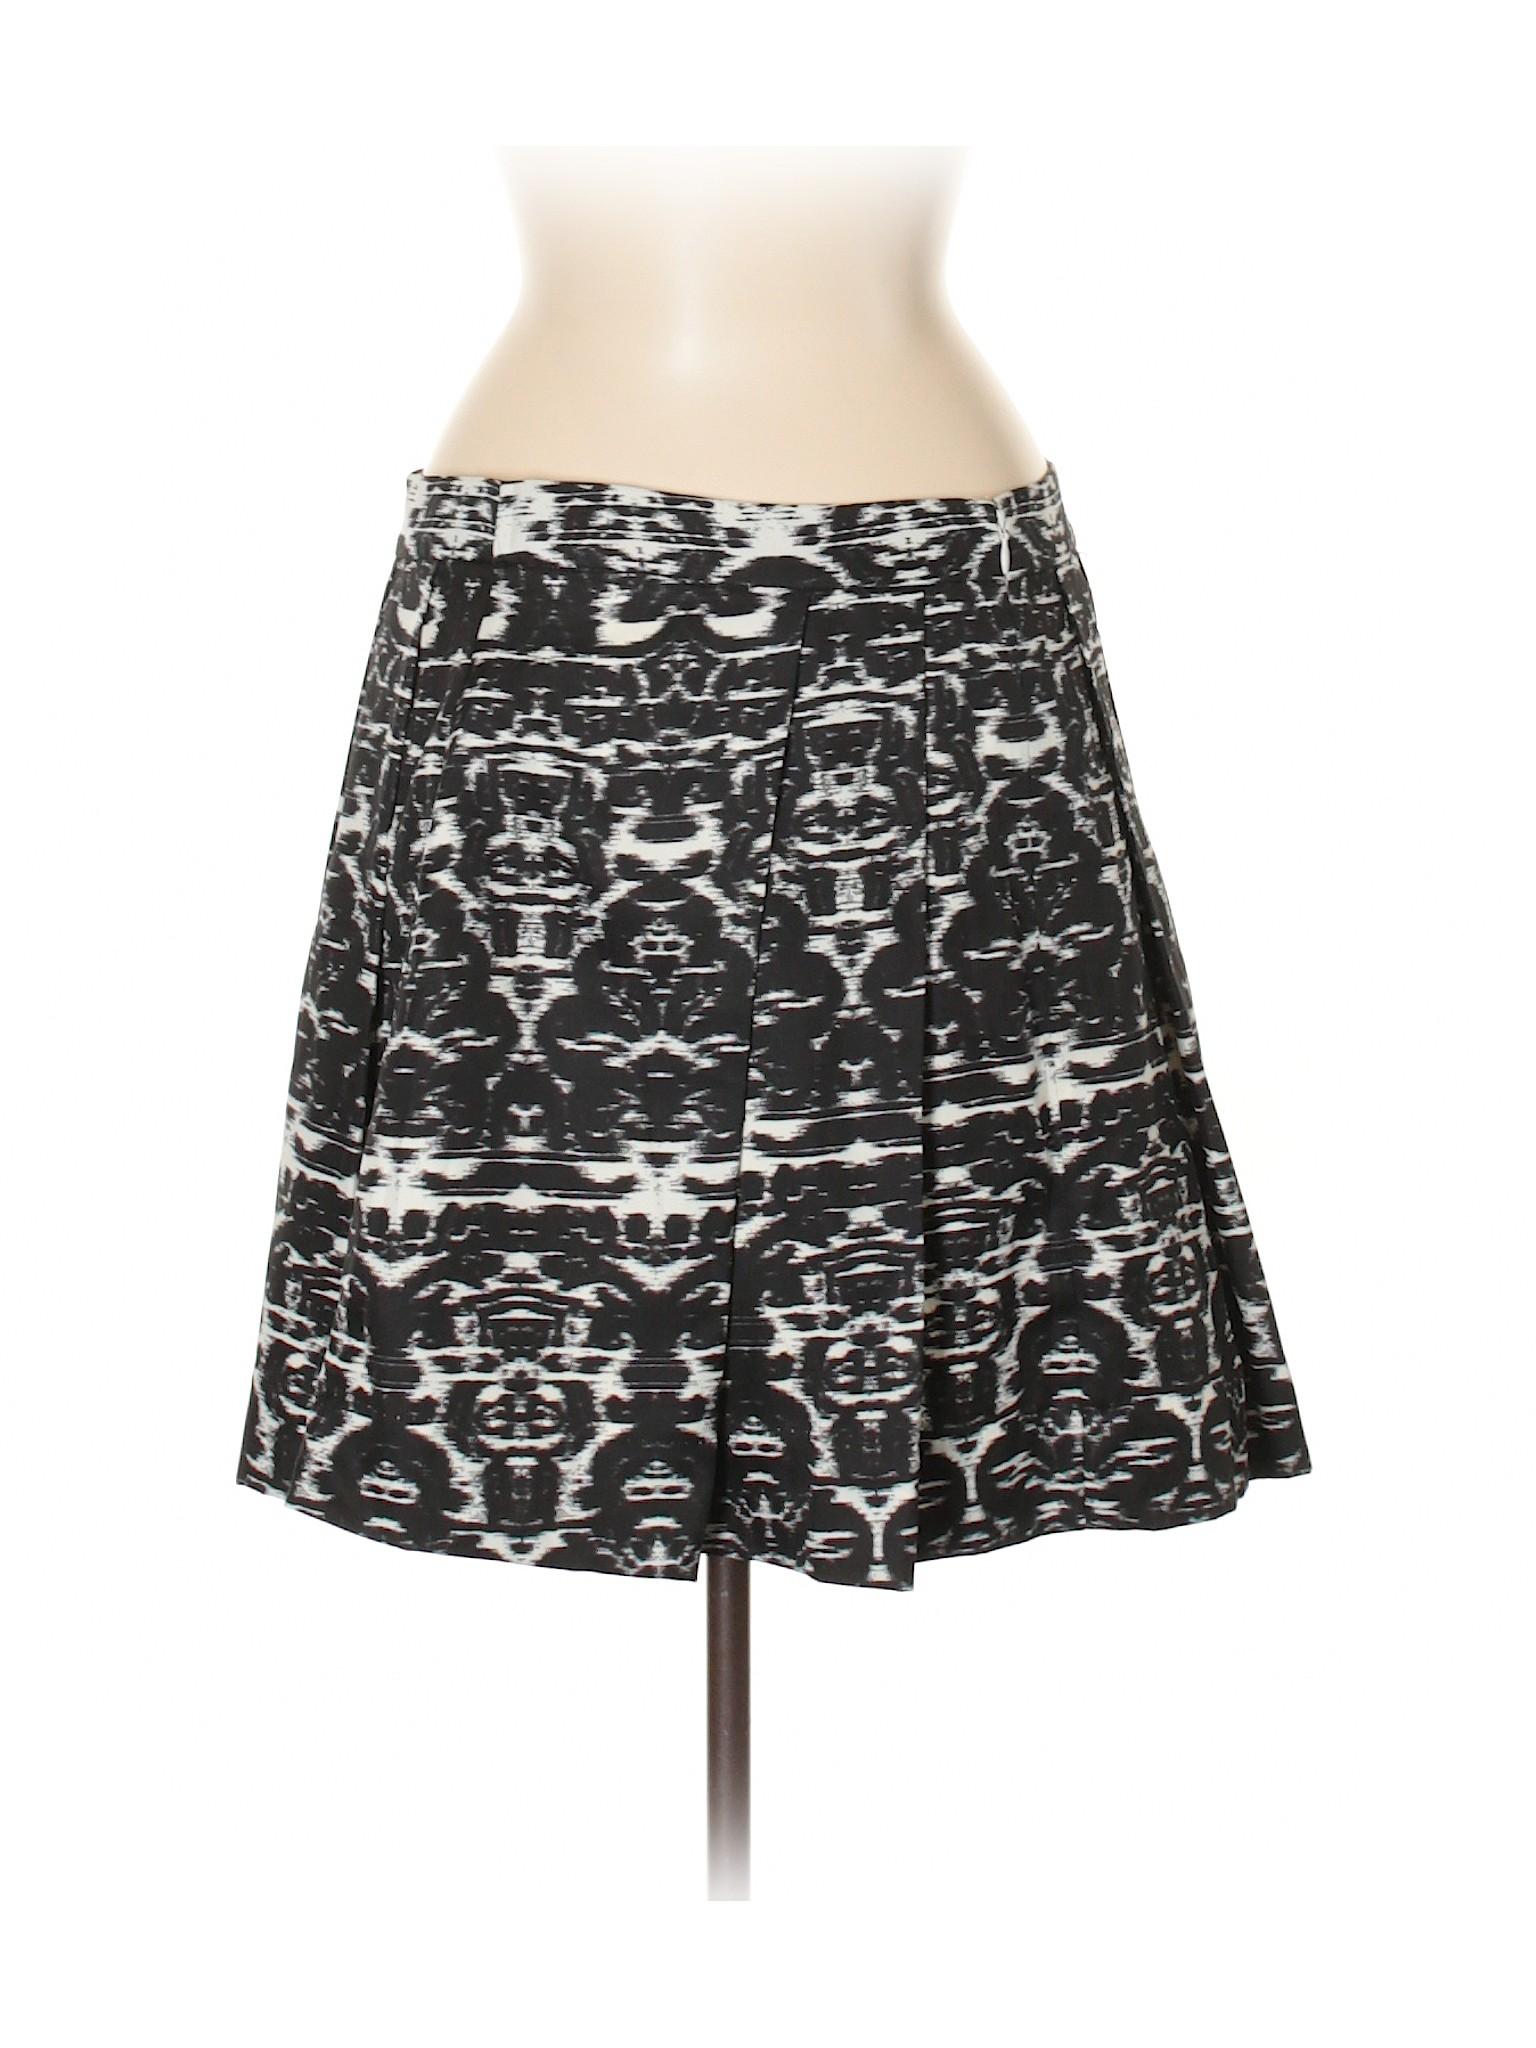 Boutique Casual Casual Skirt Boutique Casual Boutique Skirt 6qB5C